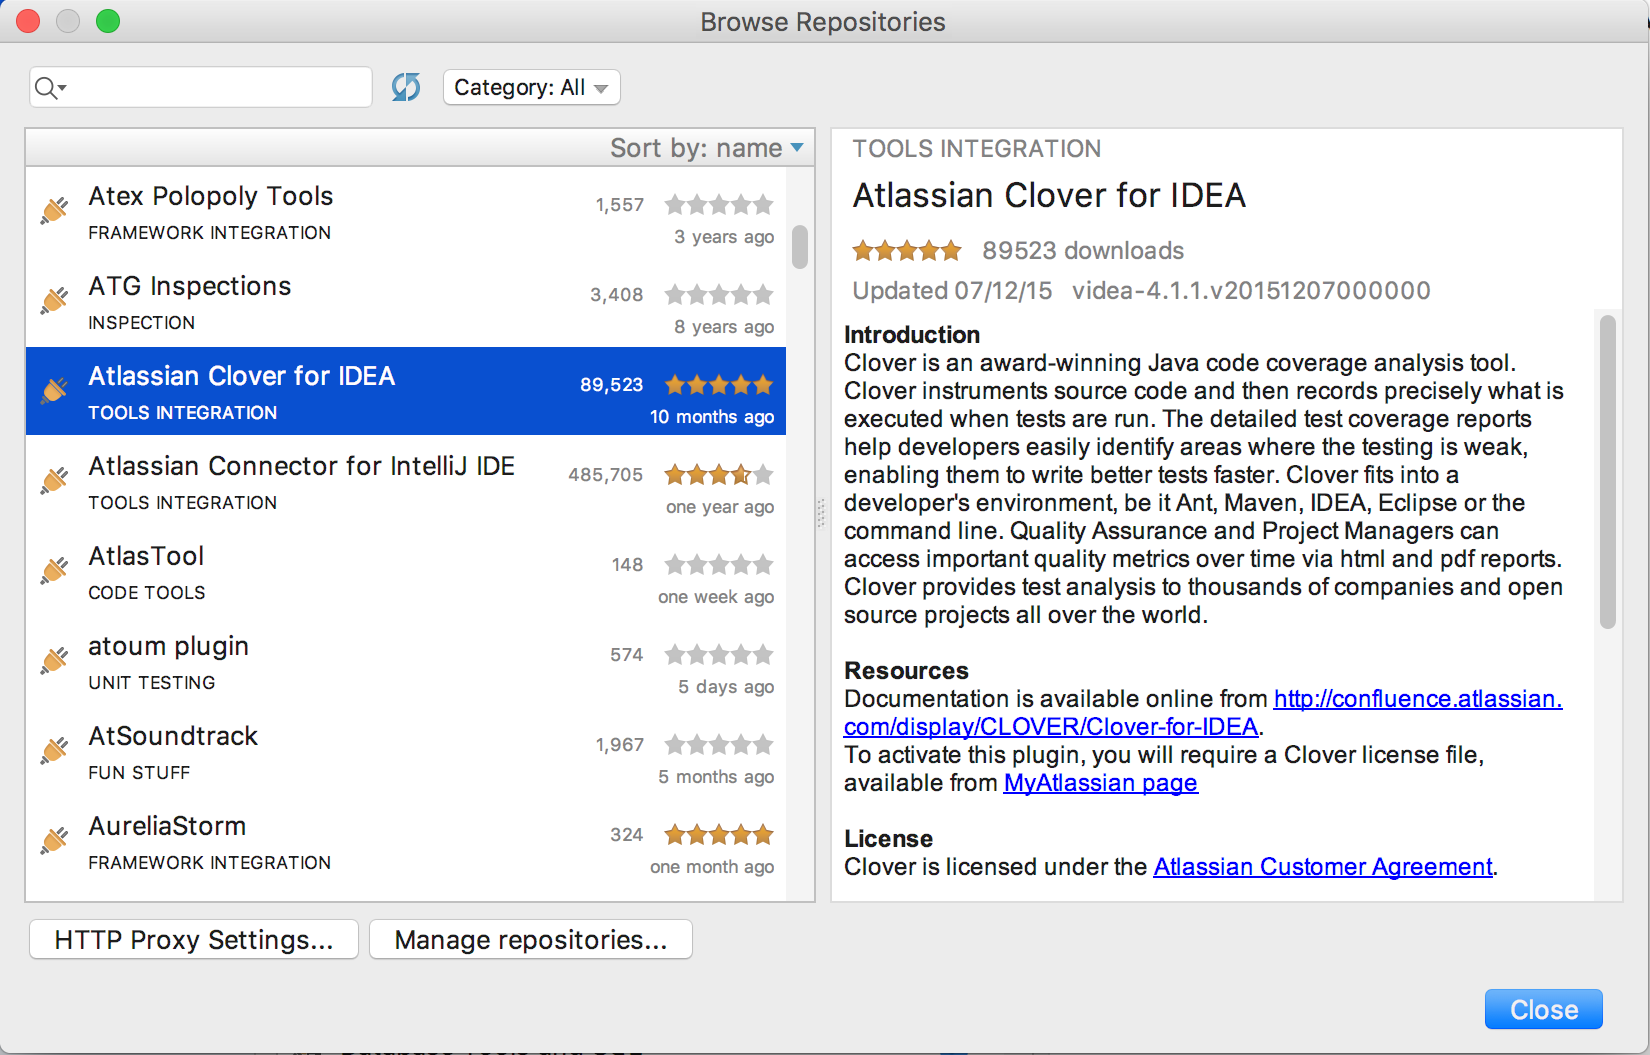 Clover-for-IDEA Installation Guide - Atlassian Documentation